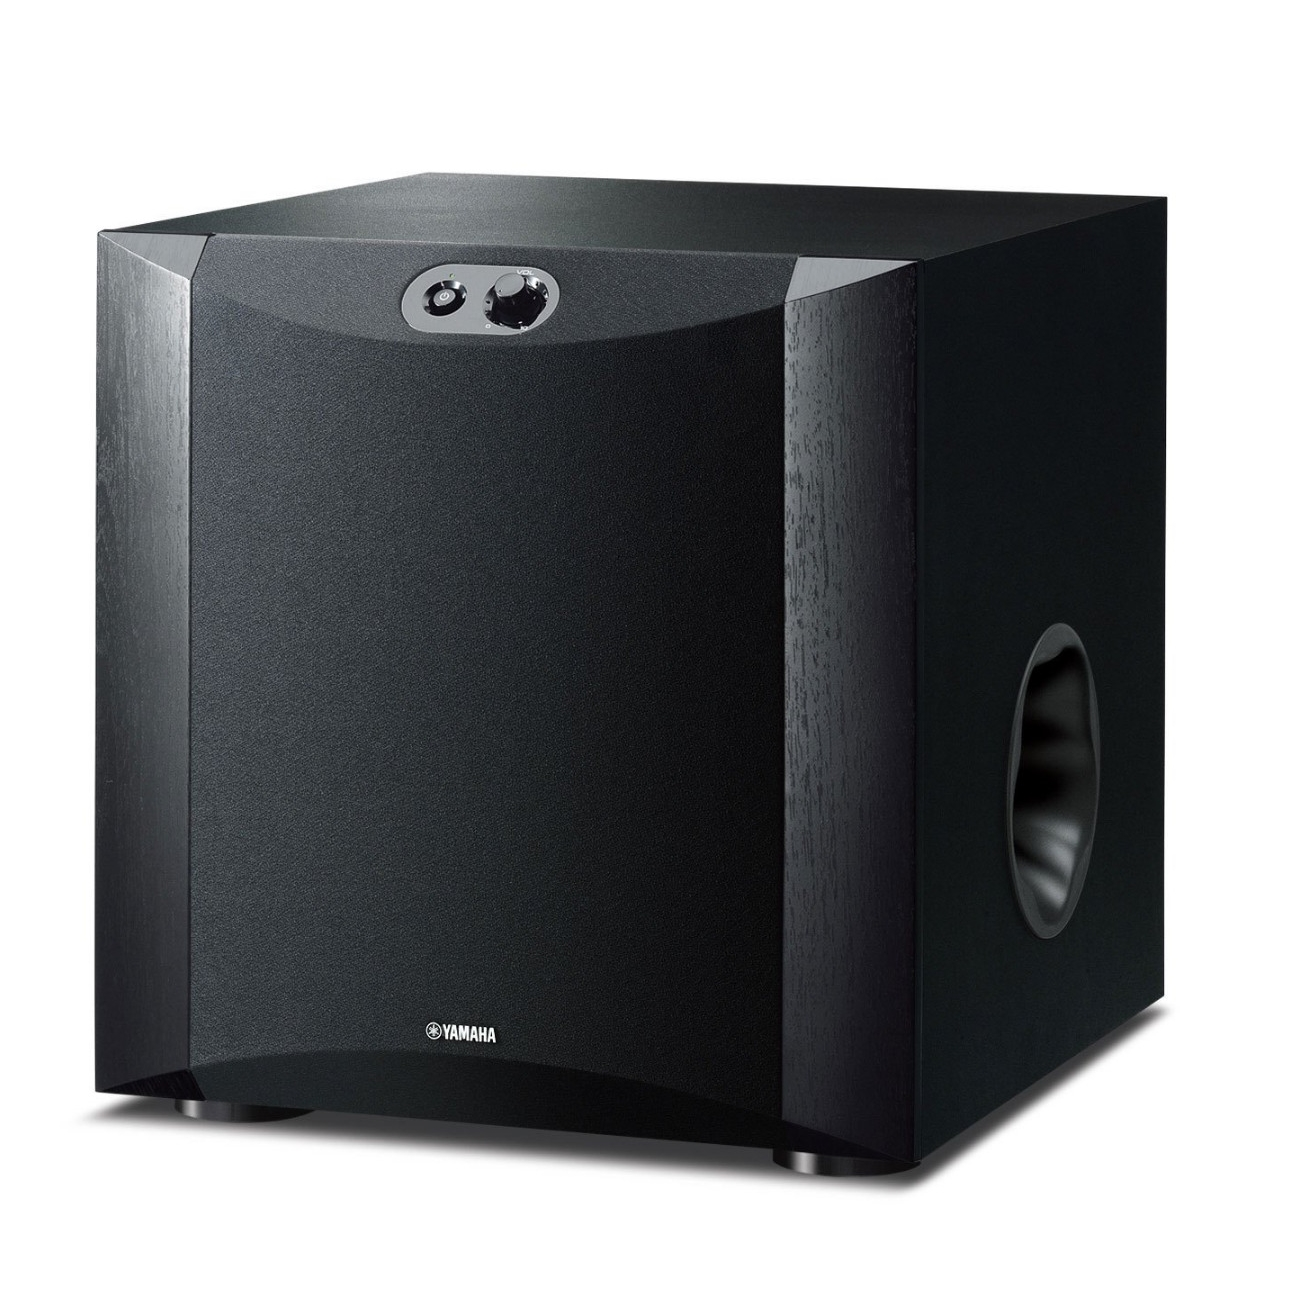 YAMAHA 超重低音喇叭 NS-SW300BK